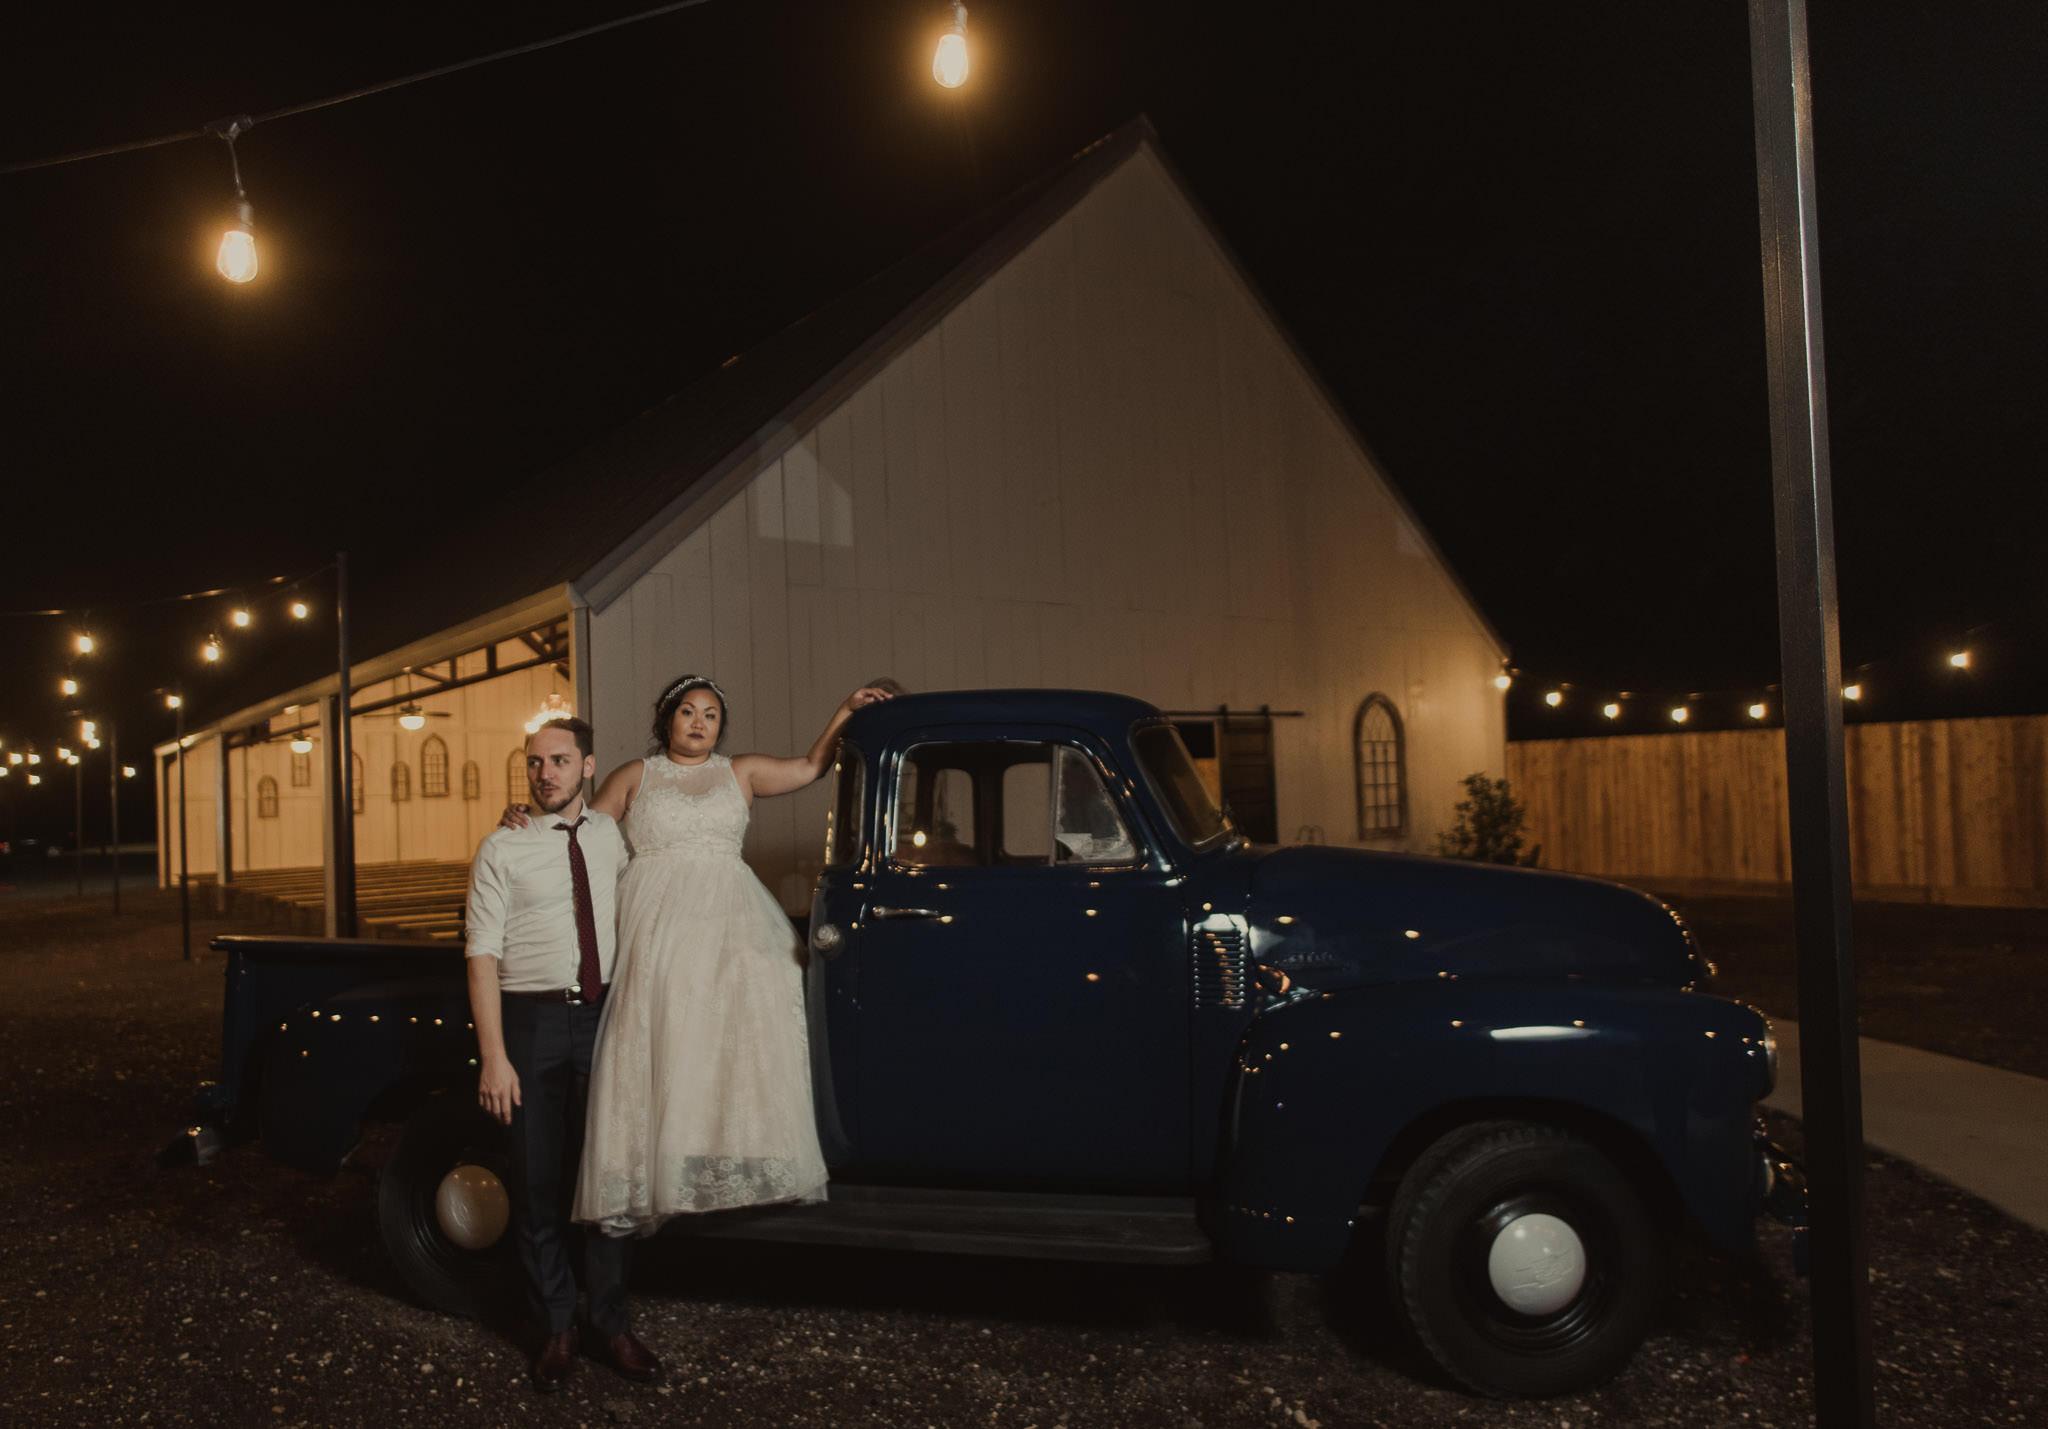 Hochziet-hall-old-town-spring-houston-texas-wedding-venue-photographer-classic-vintage